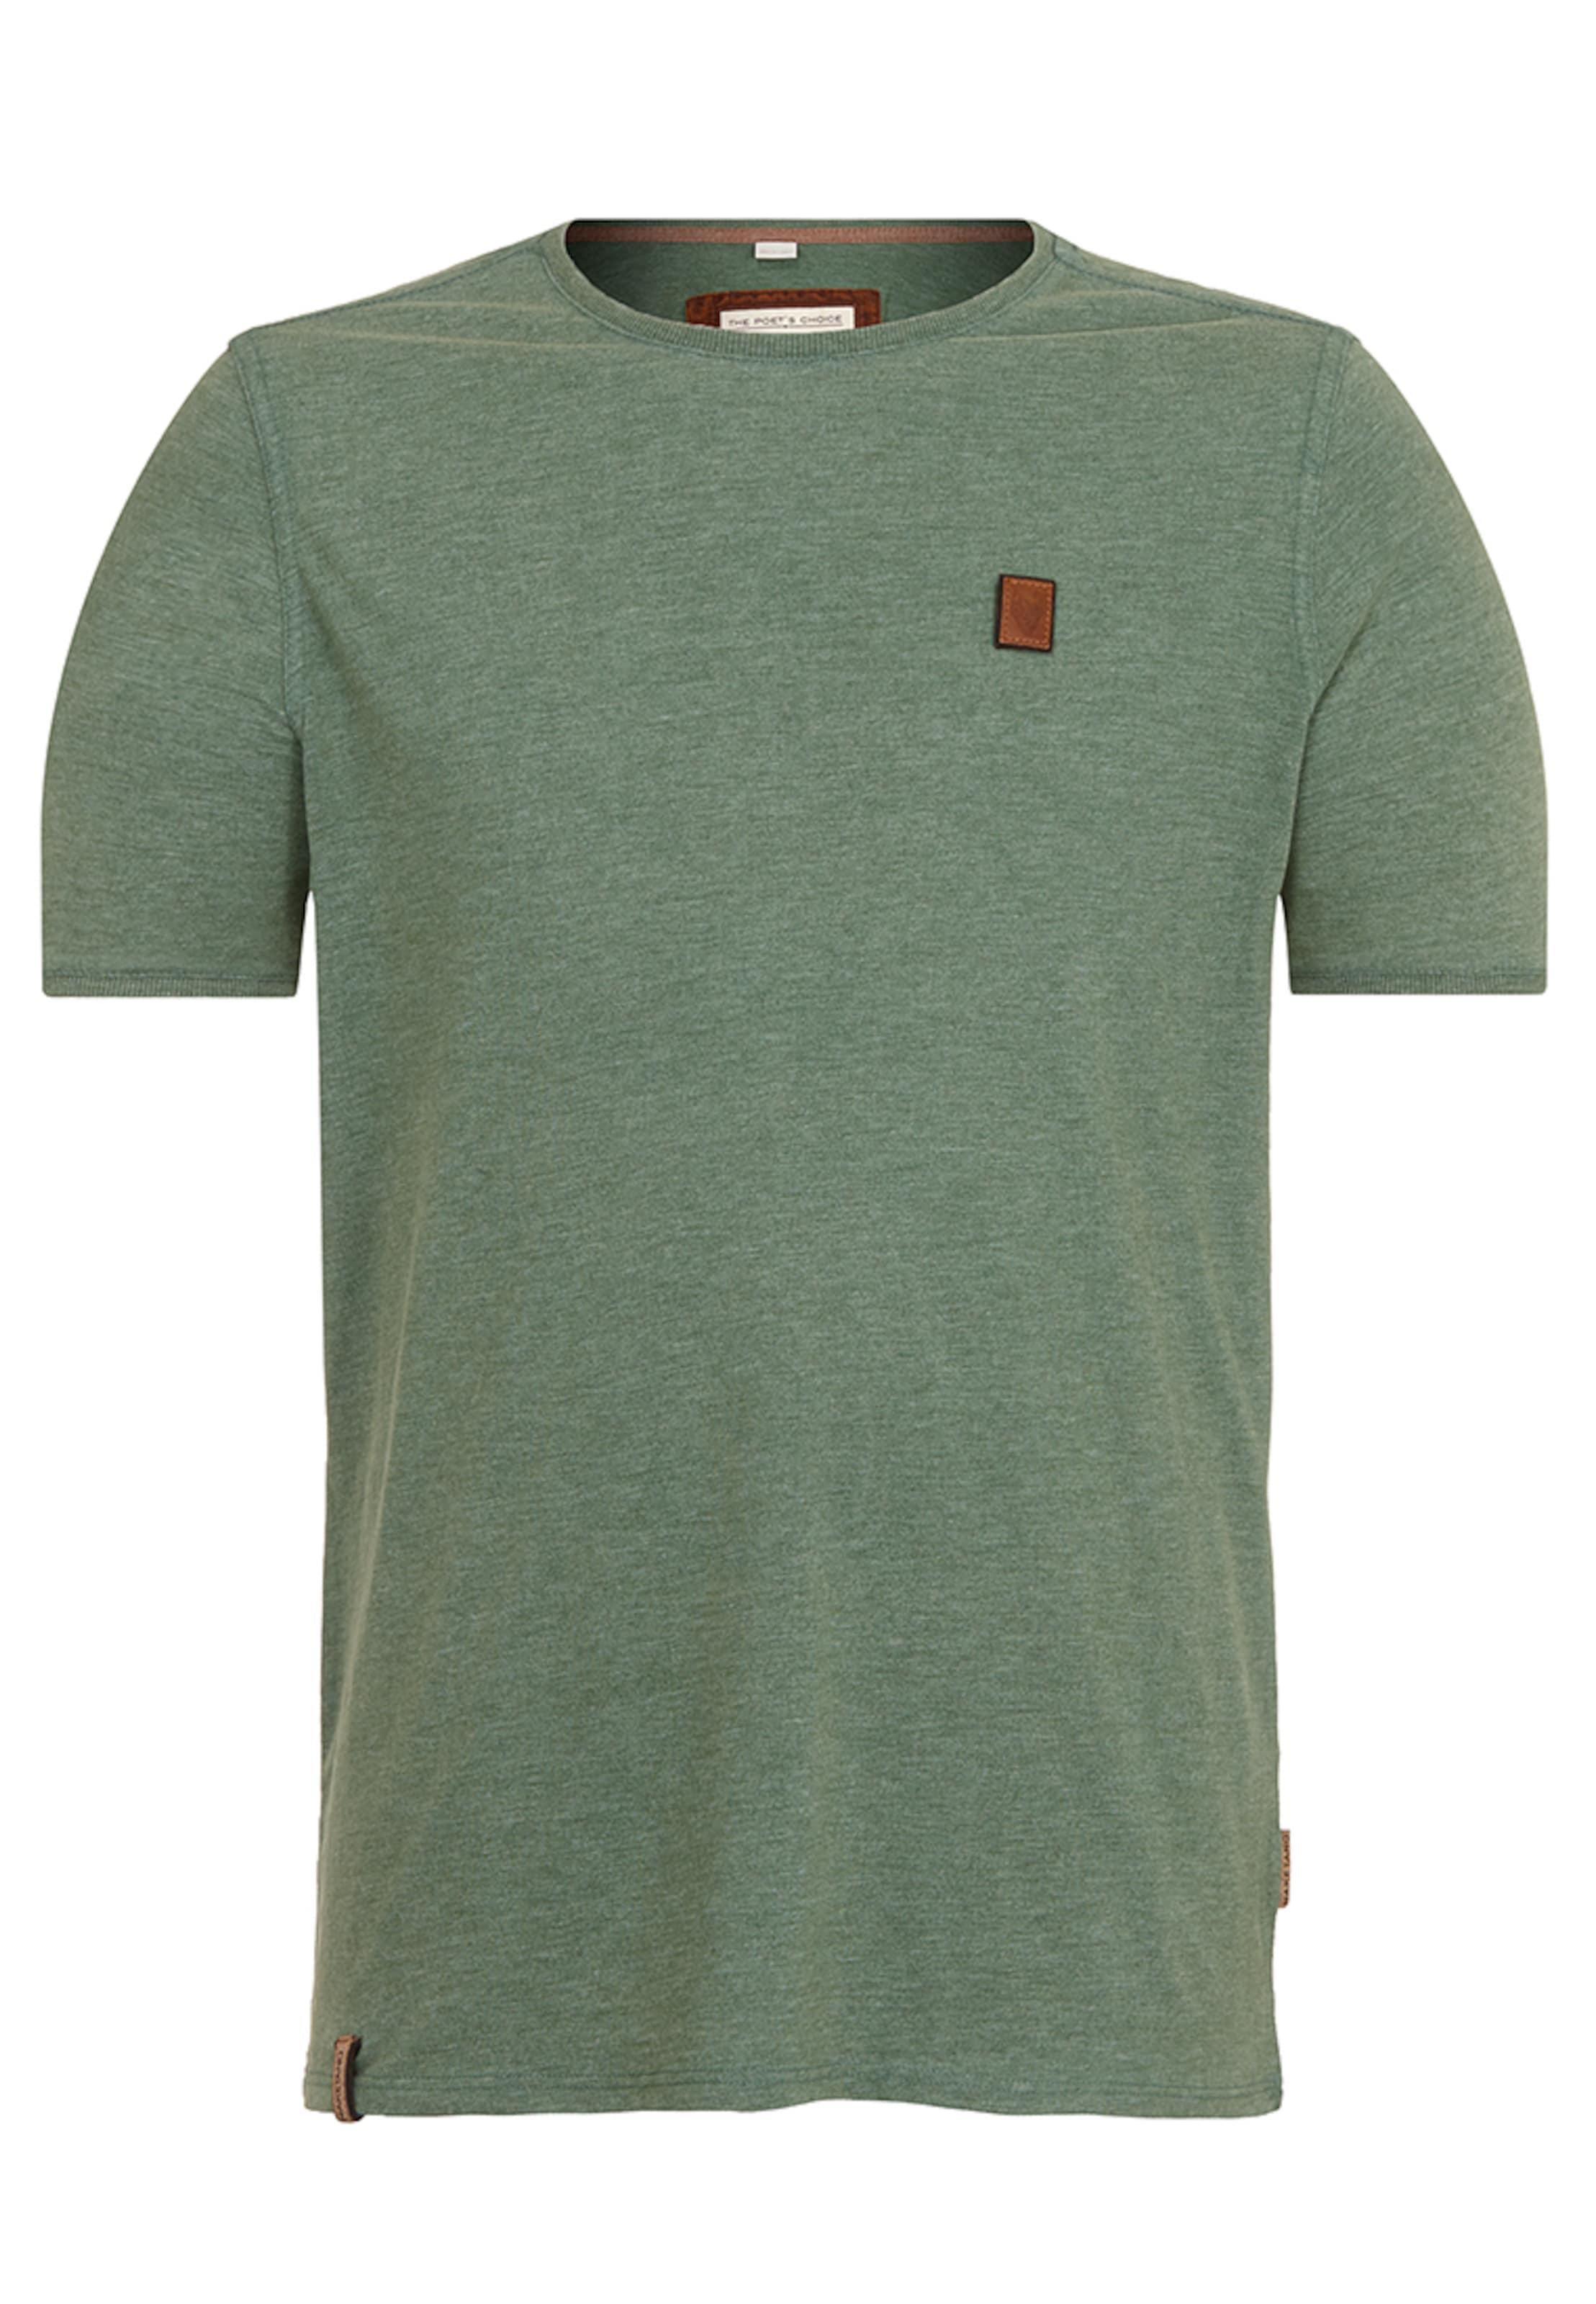 Shirt naketano III' Trabando 'Halim T Male naketano Male zzxqCwpU